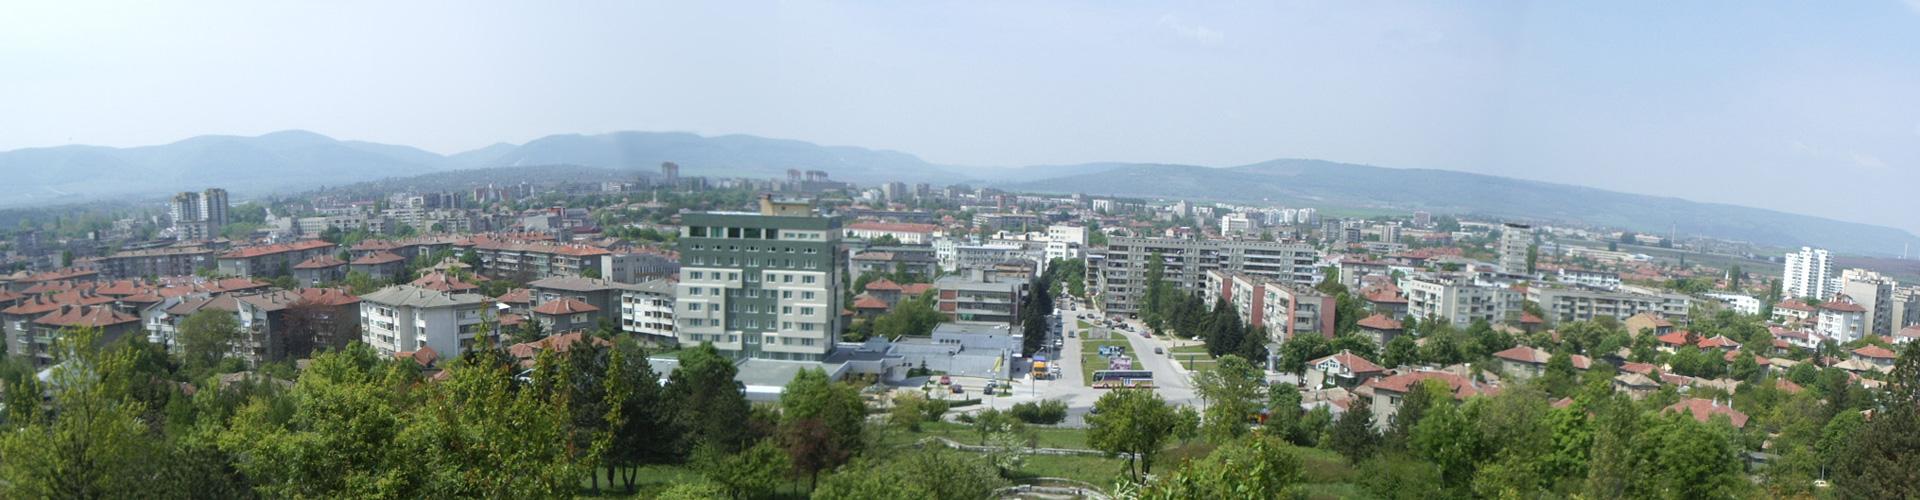 TransferTaxi-EUROPE   Targovishte1panorama_by_Plamen-Petkov - TransferTaxi-EUROPE